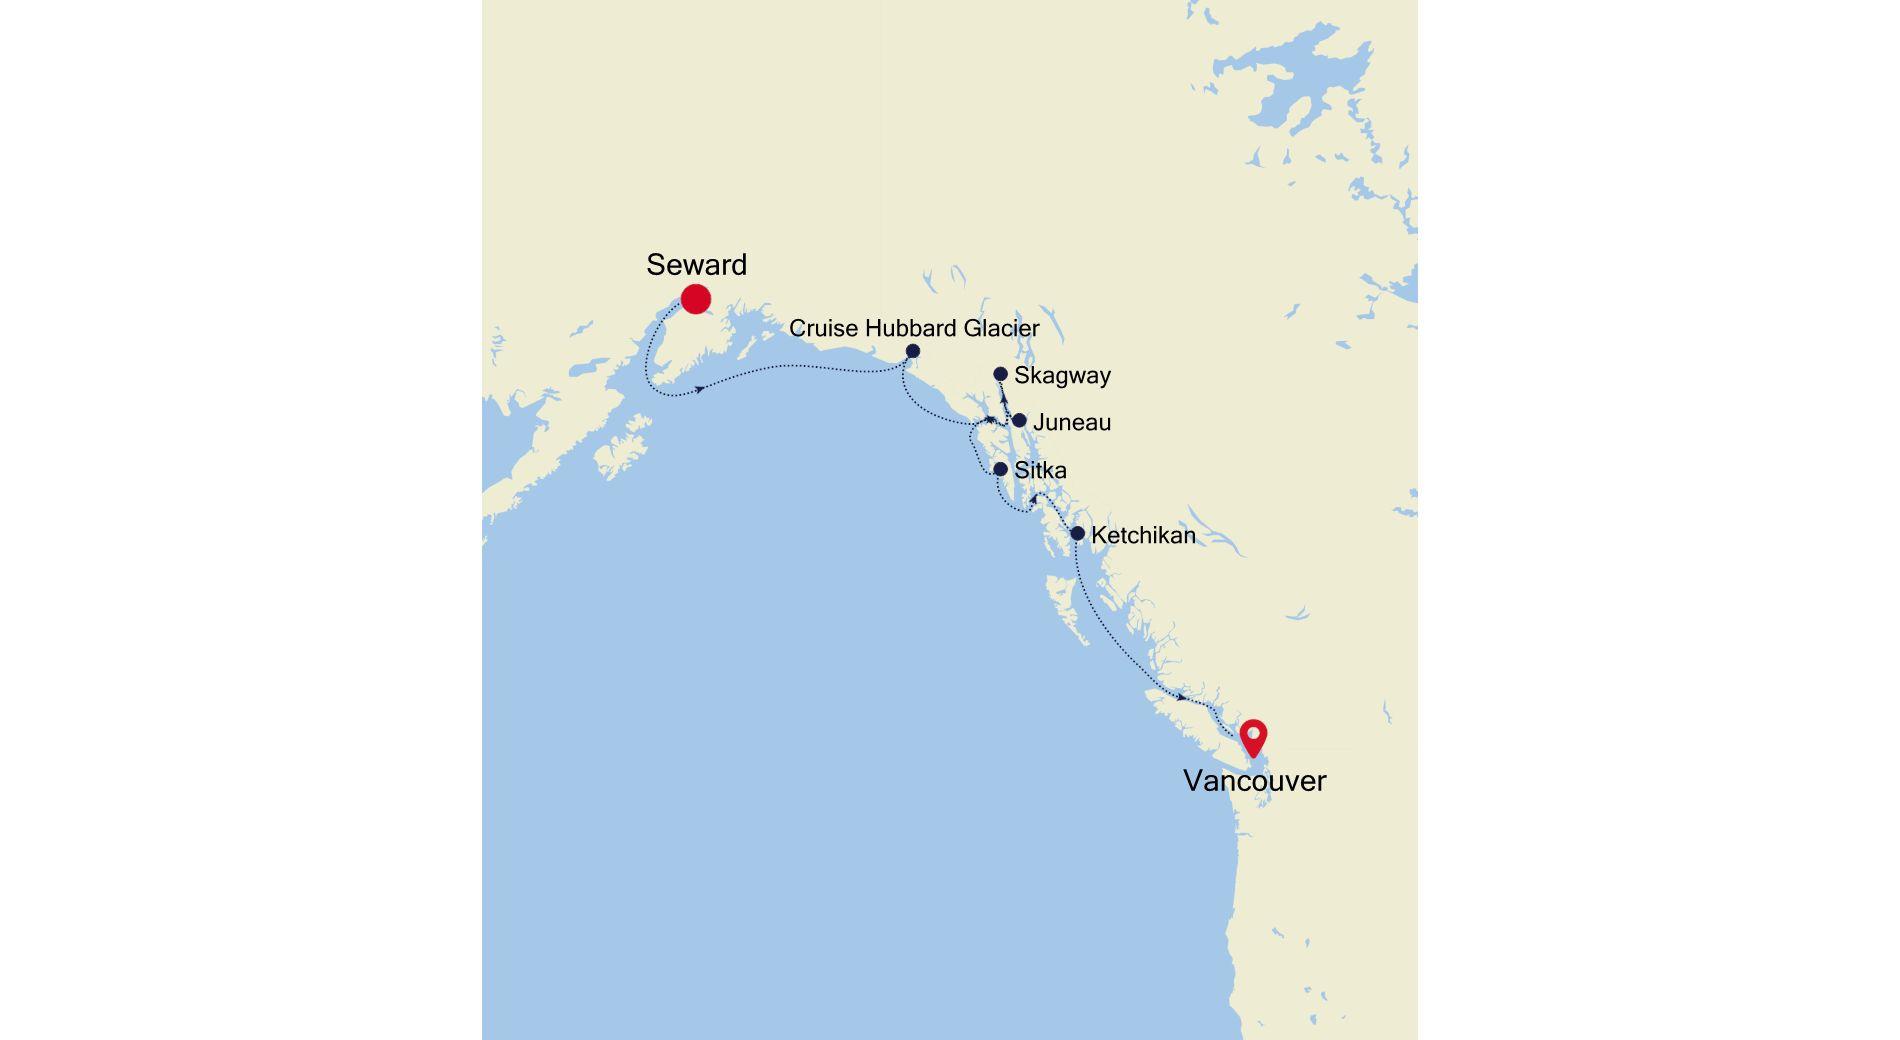 6919 - Seward a Vancouver